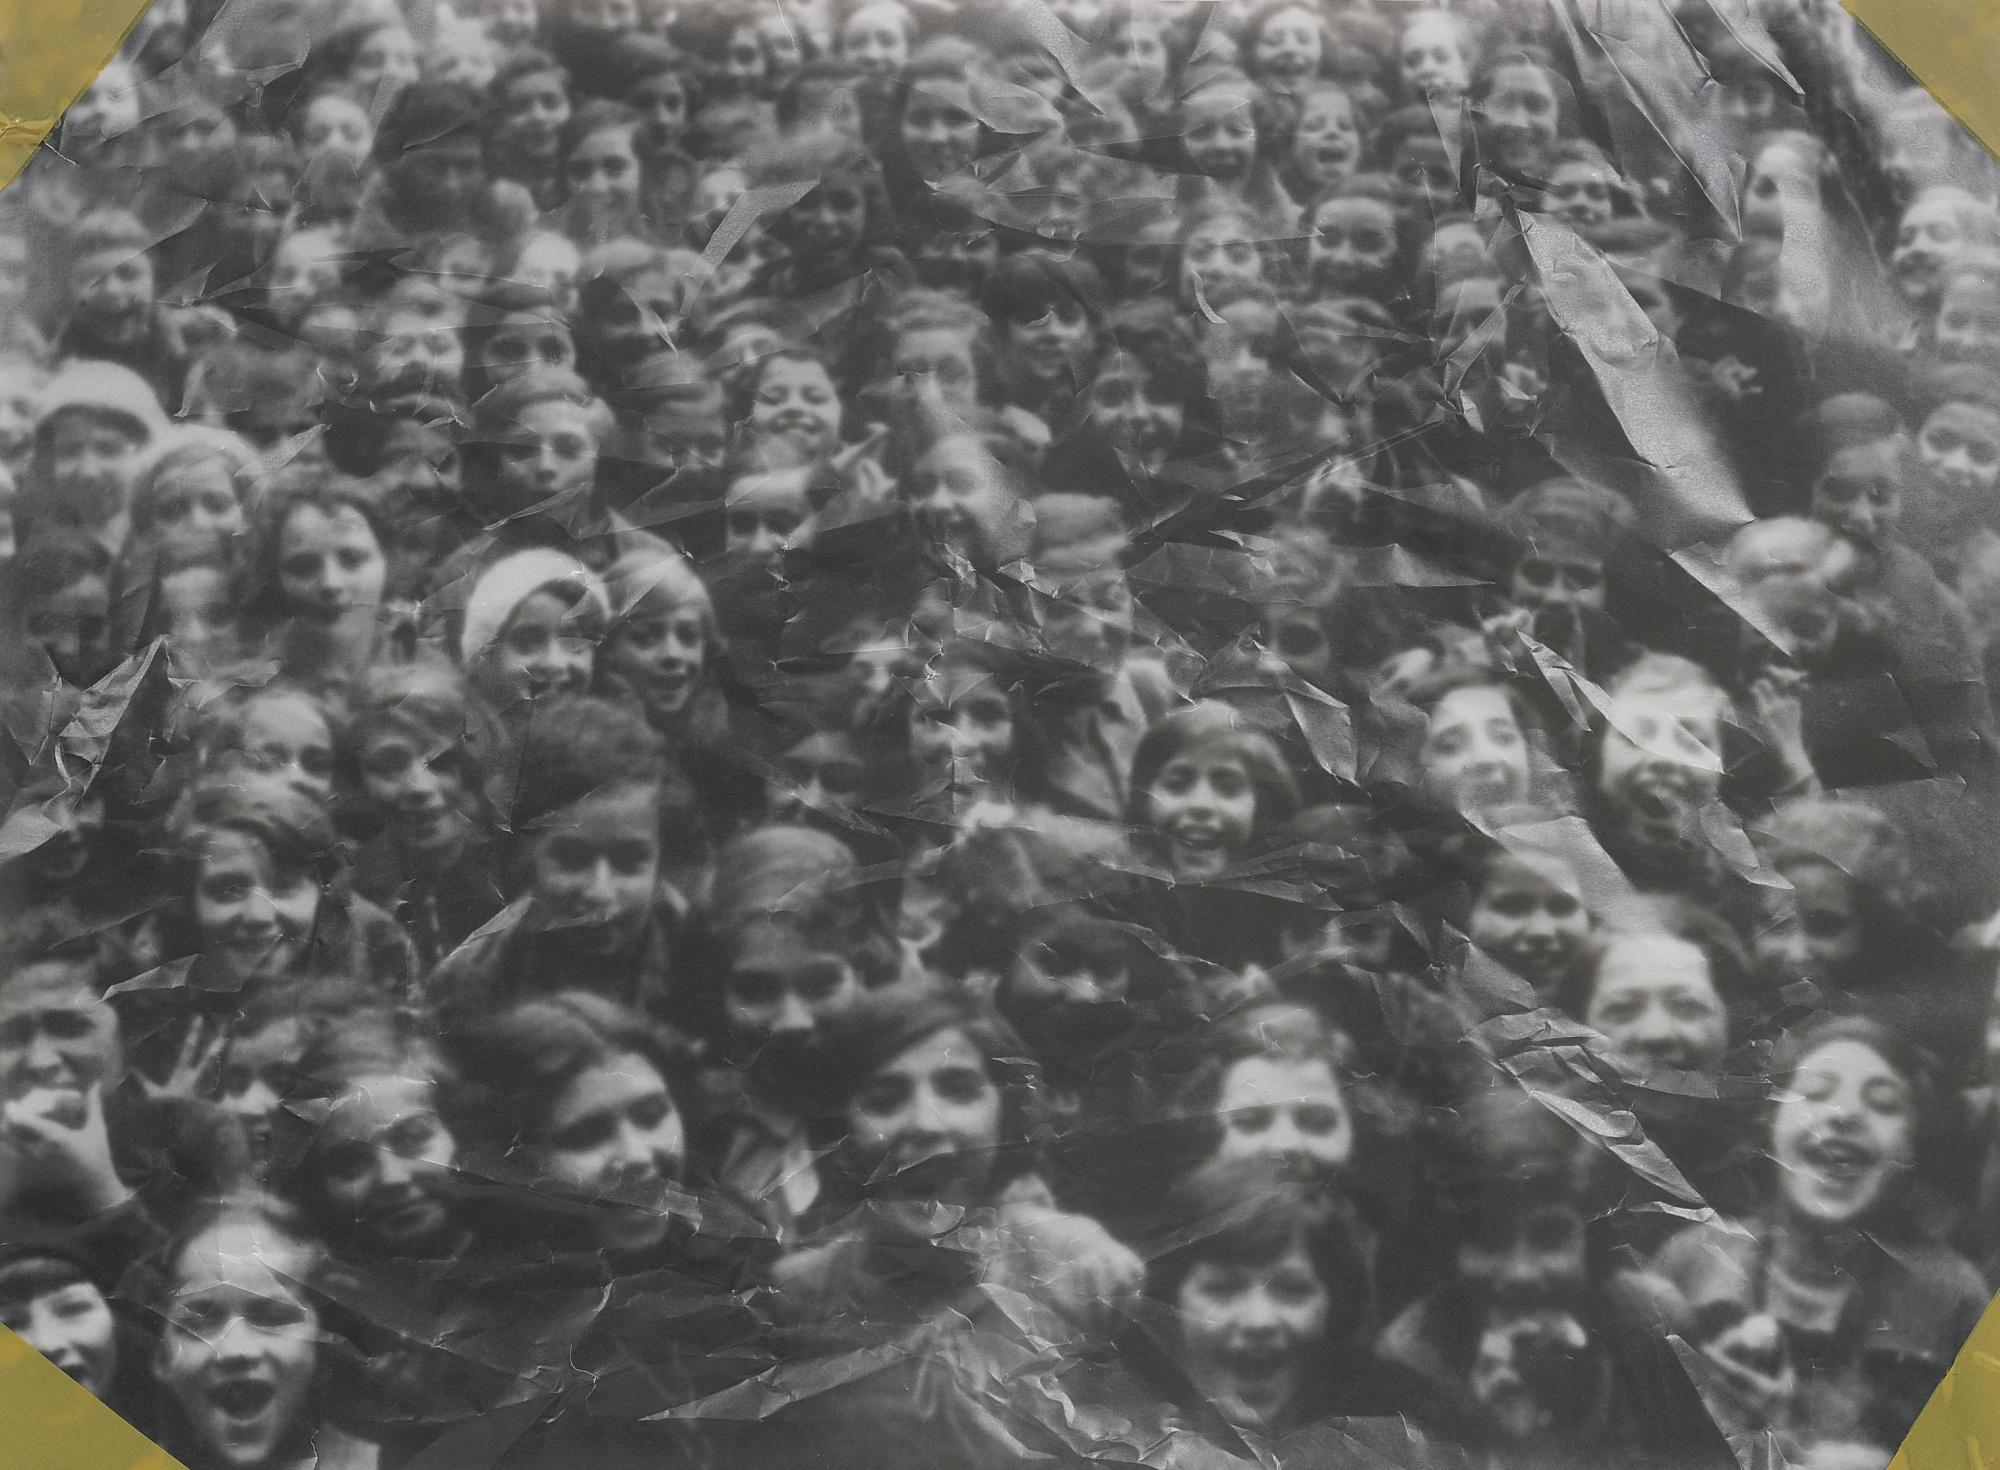 Christian Boltanski-Die Judische Schule (Berlin 1939)-1992